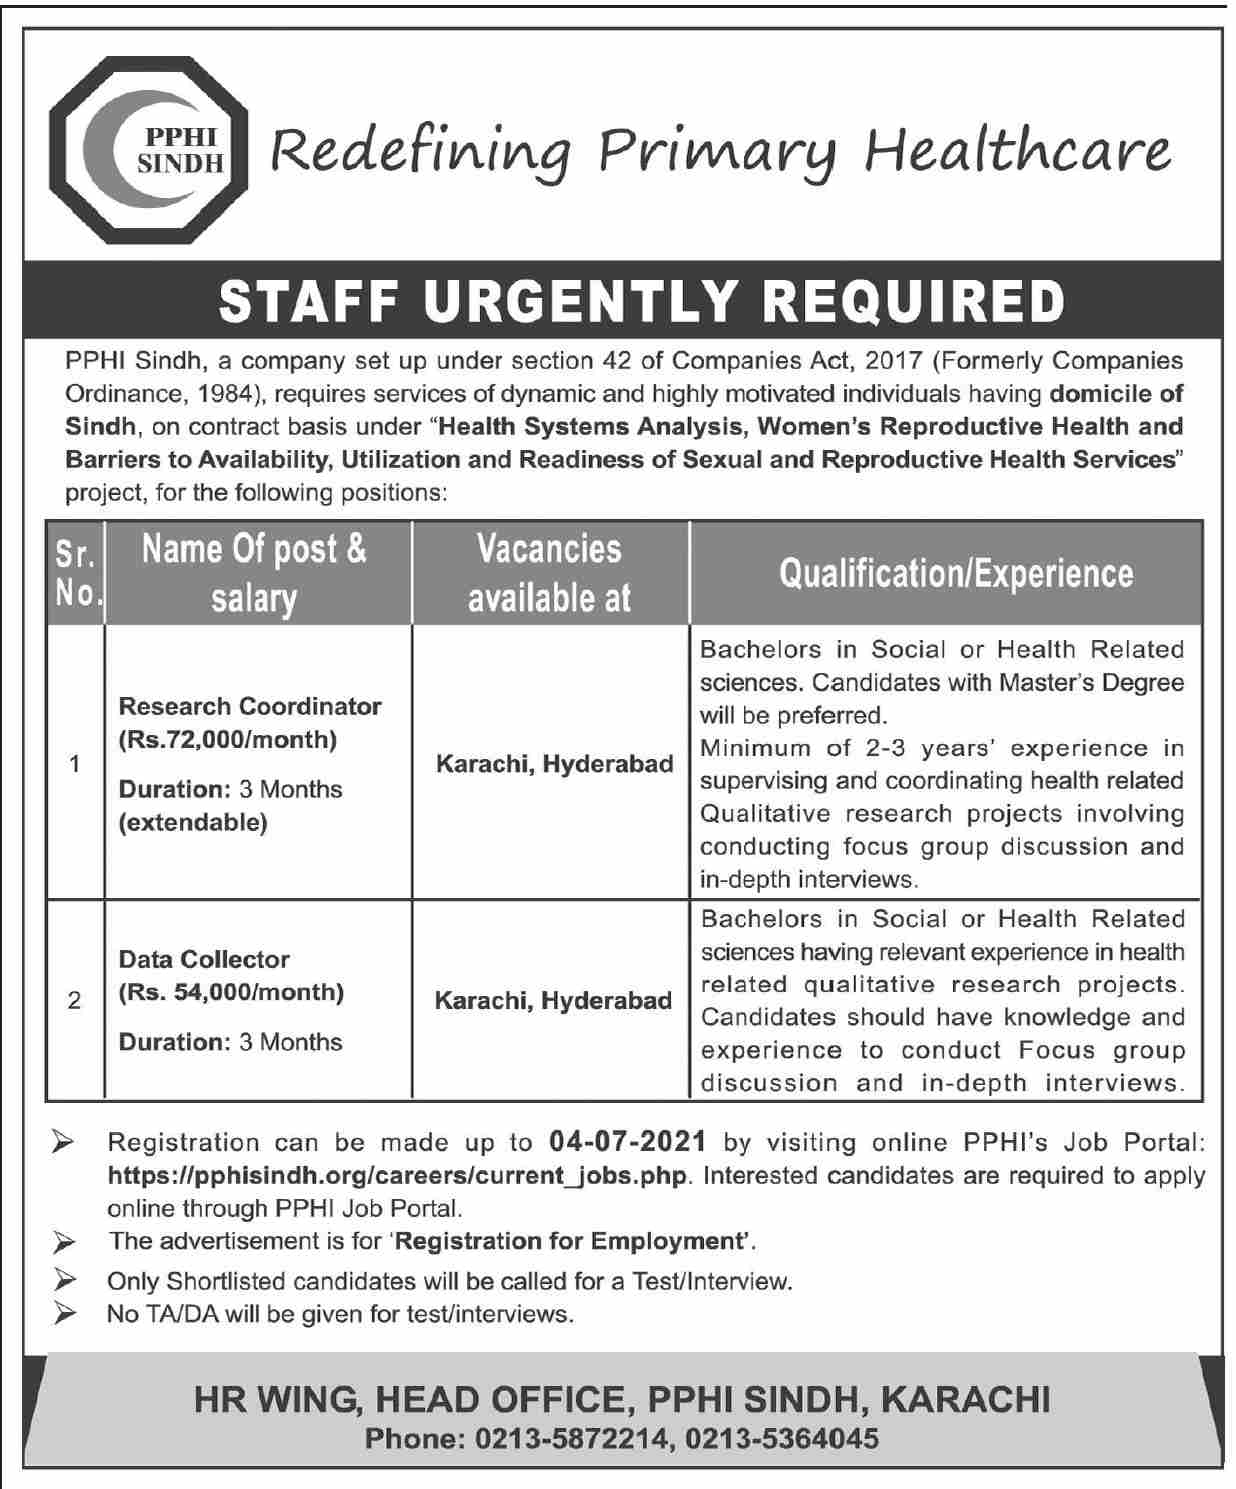 https://pphisindh.org Jobs 2021 - Redefining Primary Heathcare Jobs 2021 in Pakistan